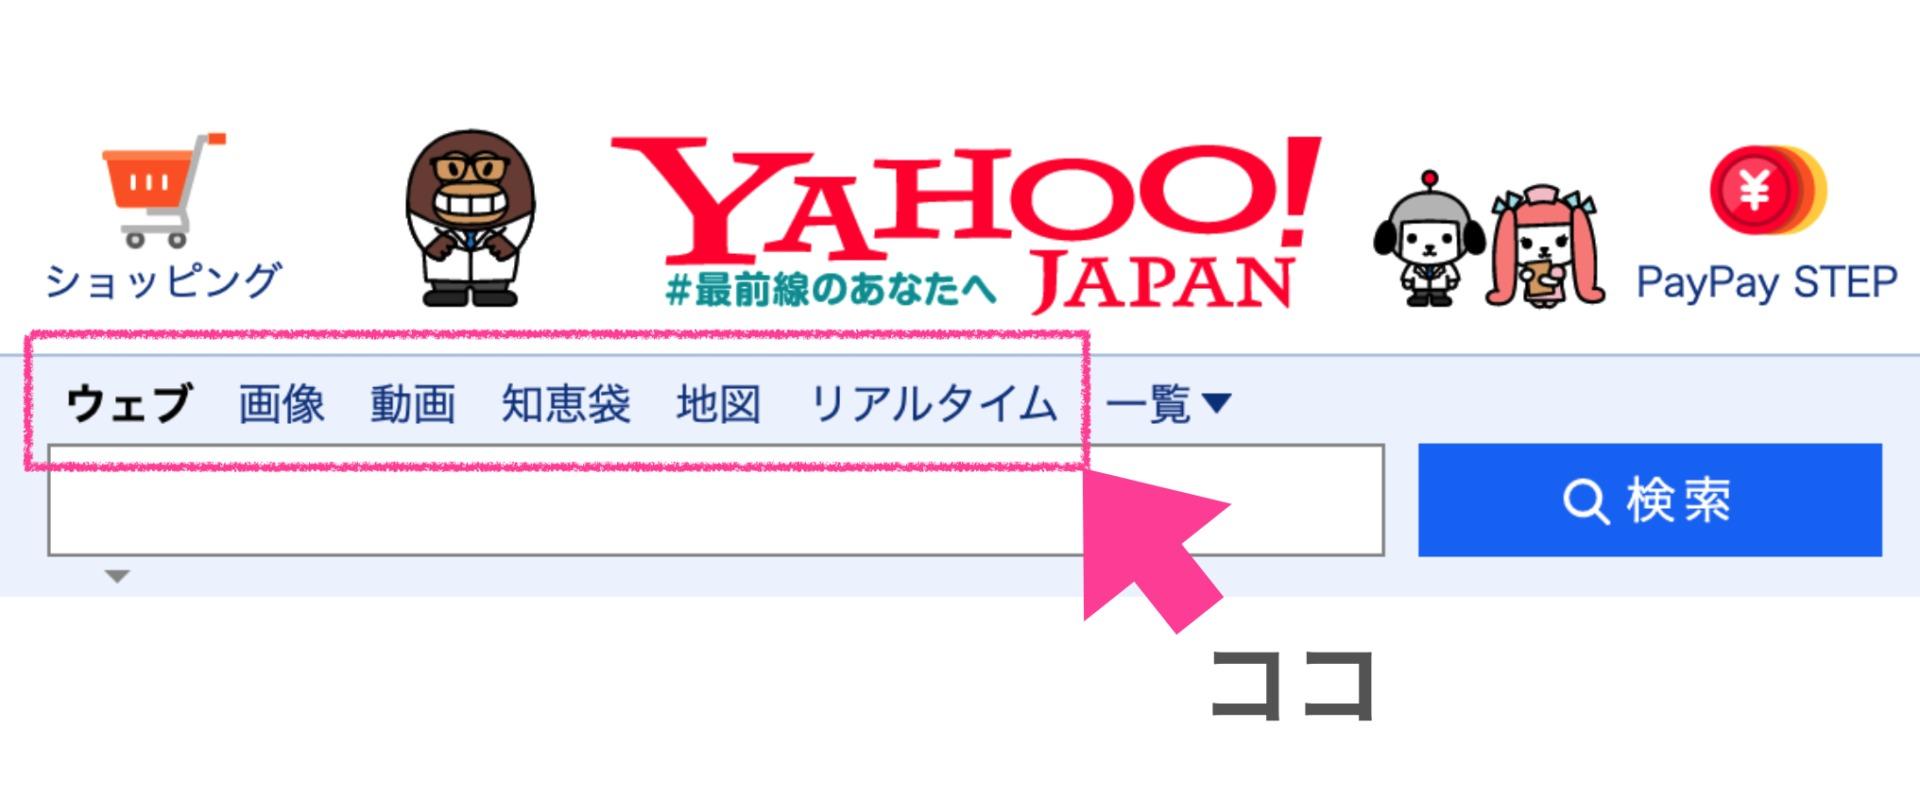 YAHOOの検索窓に目印付きのイラスト